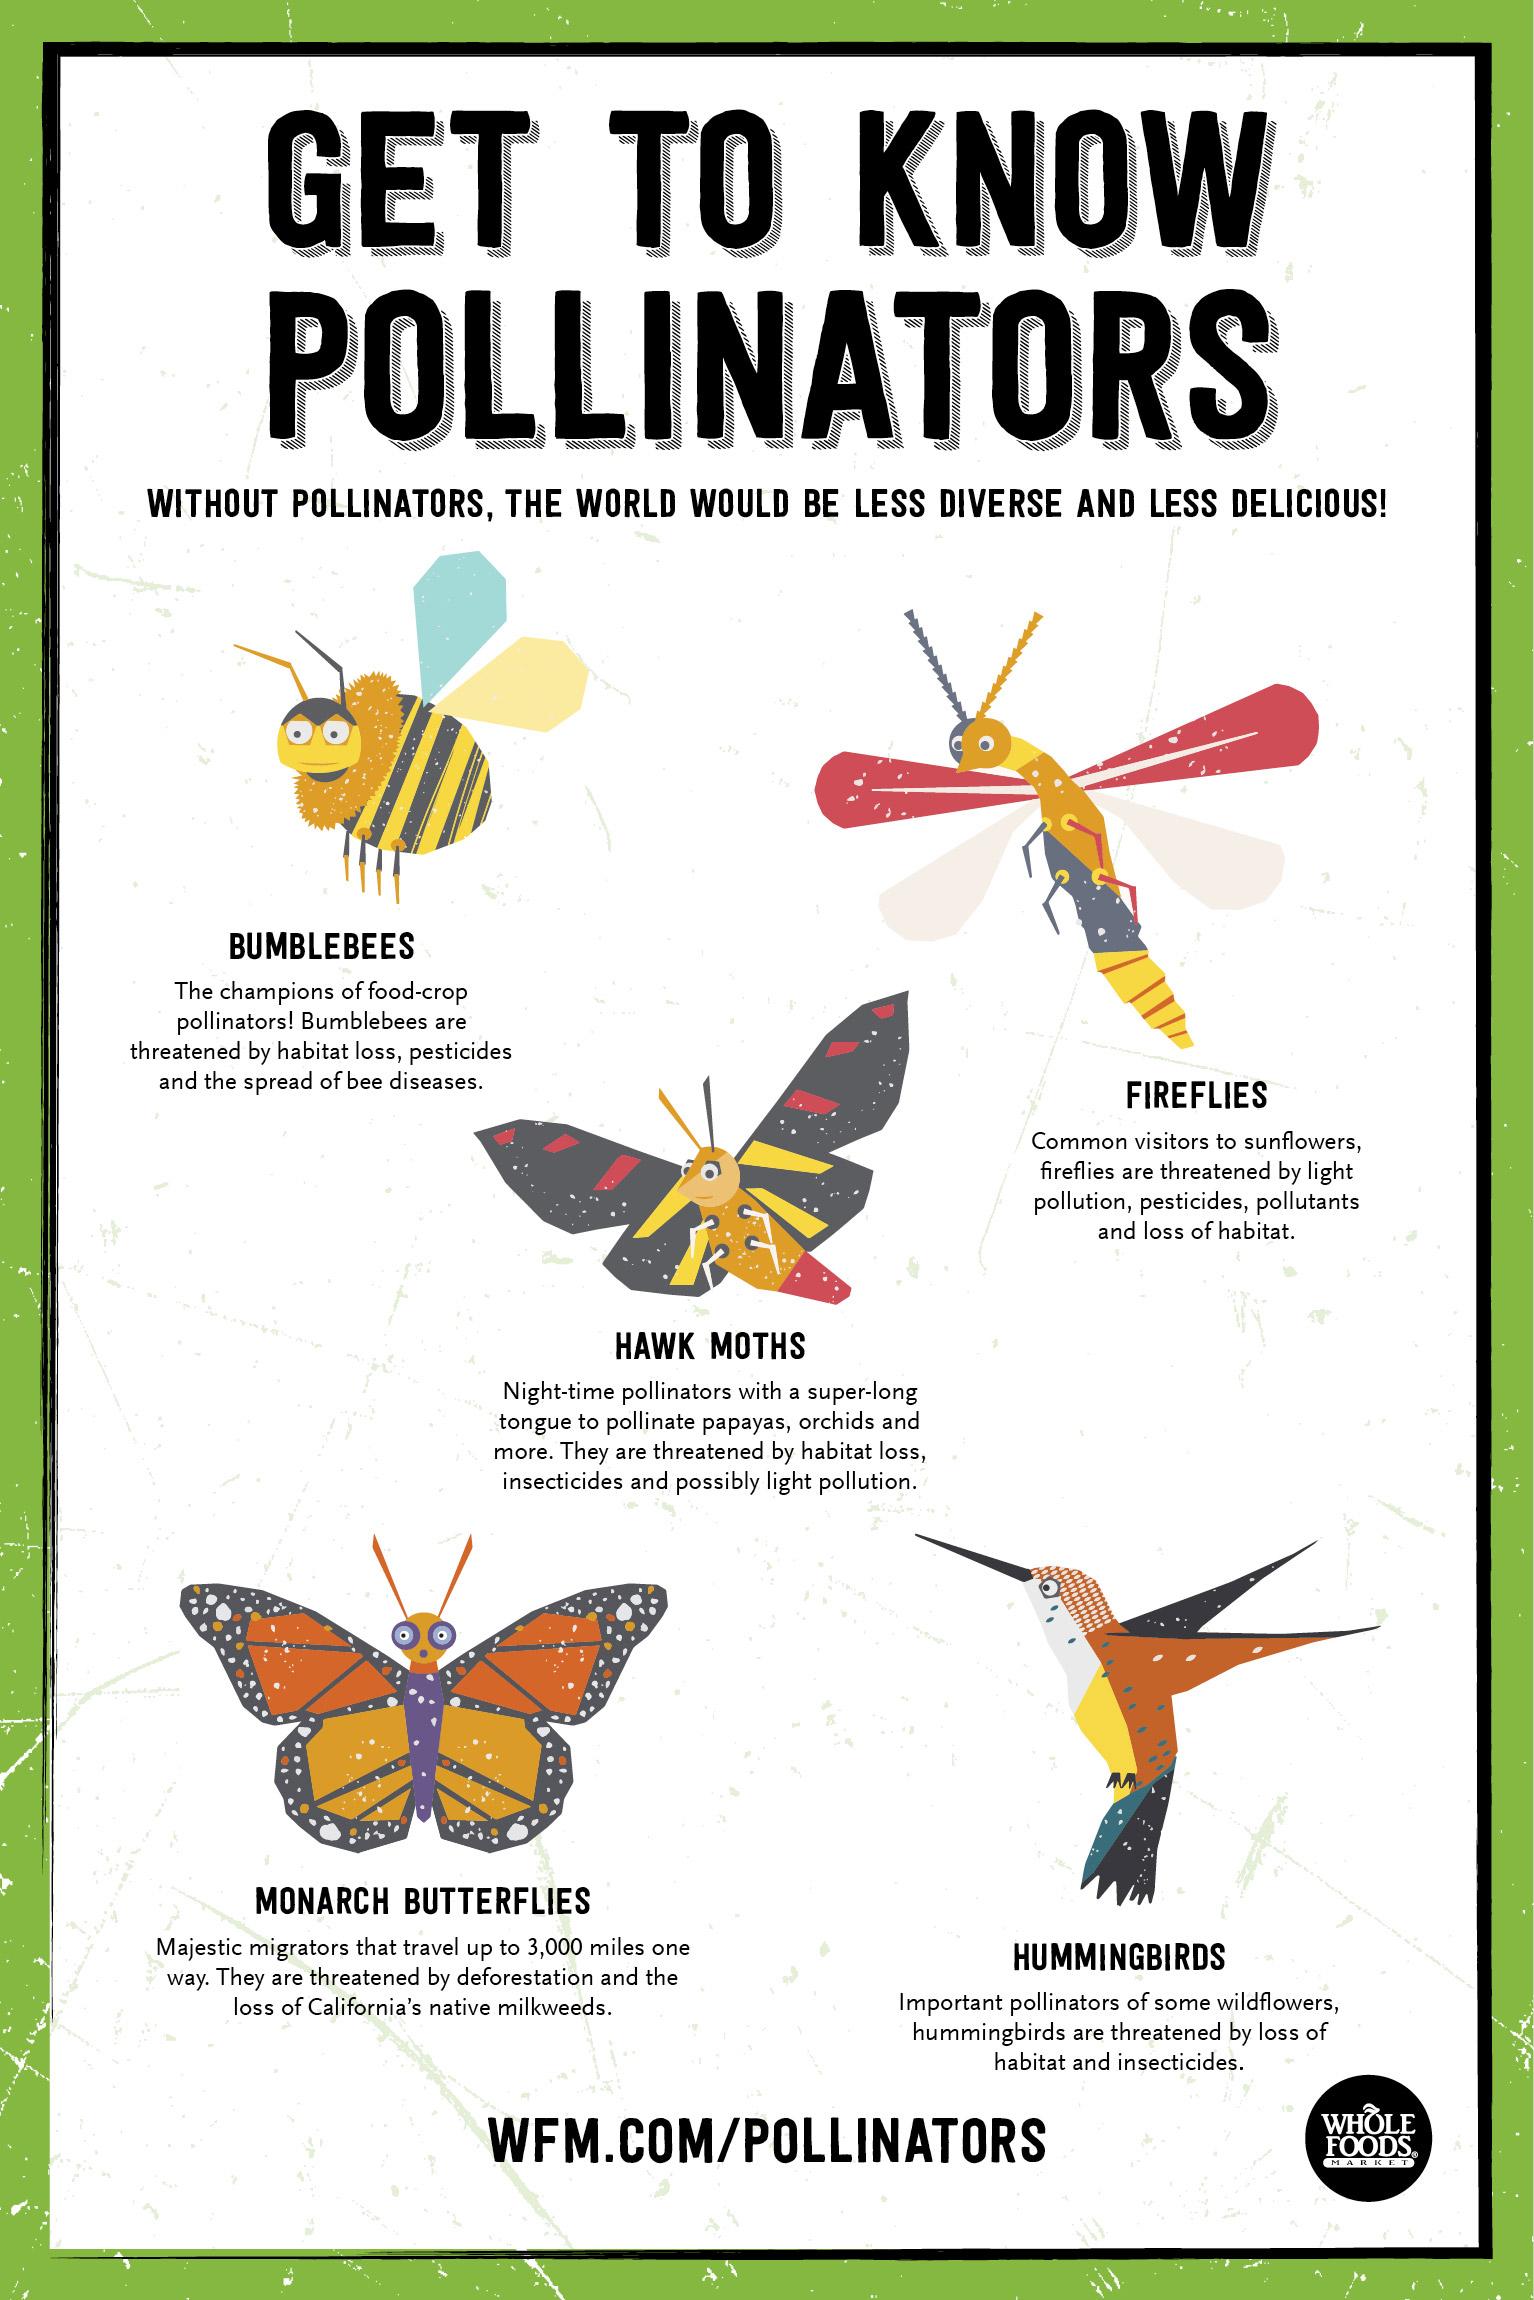 Spring_2015_Pollinators_736x1104